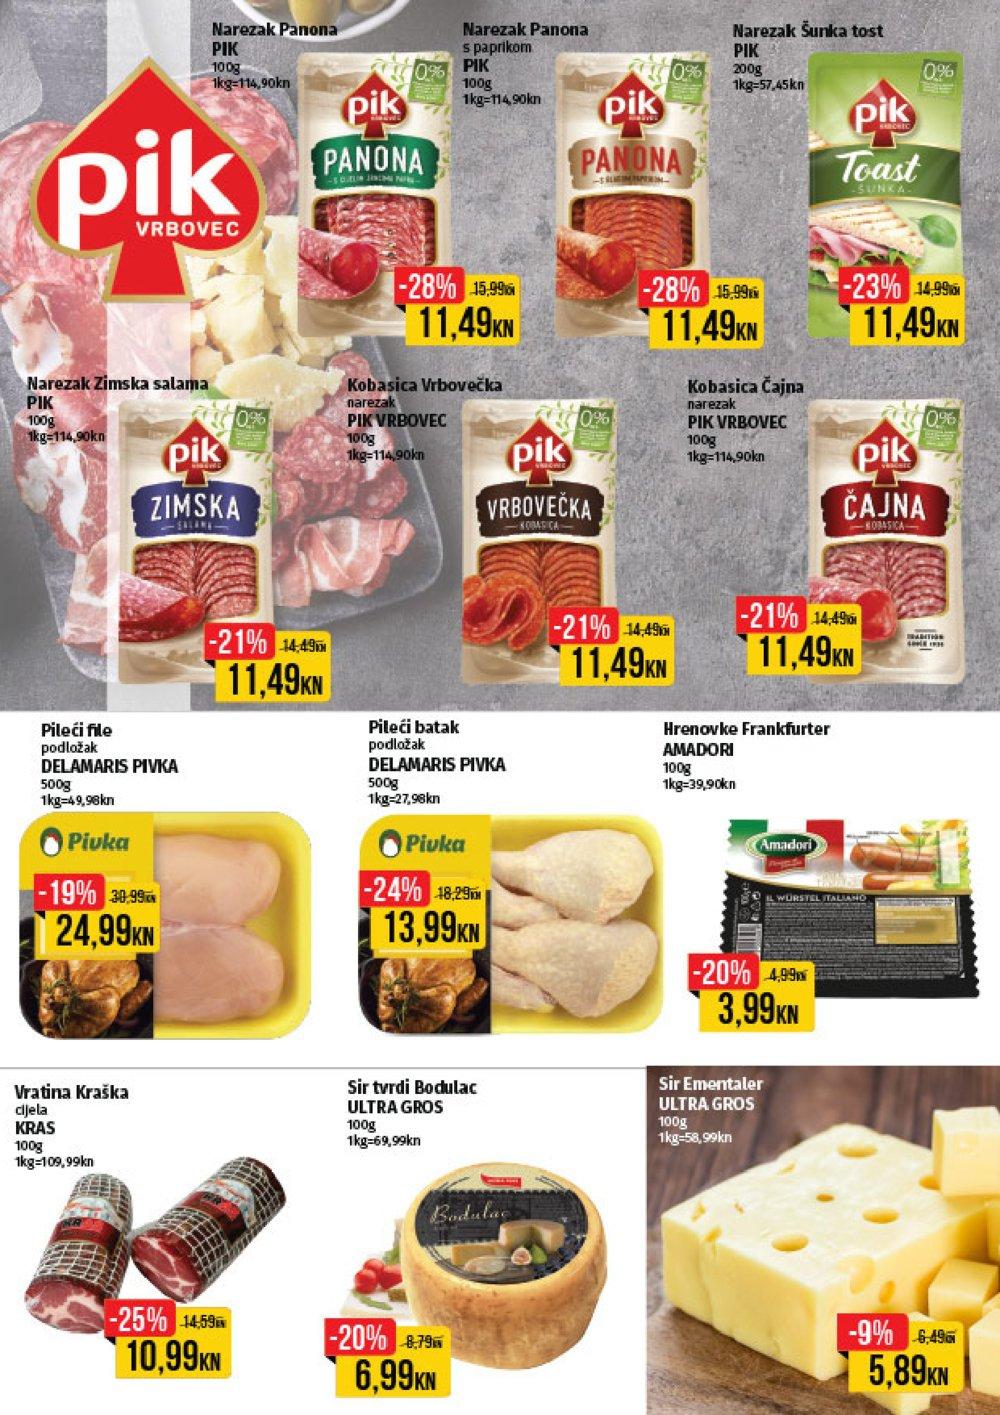 Istarski supermarketi katalog Akcija 07.10. - 20.10.2019.